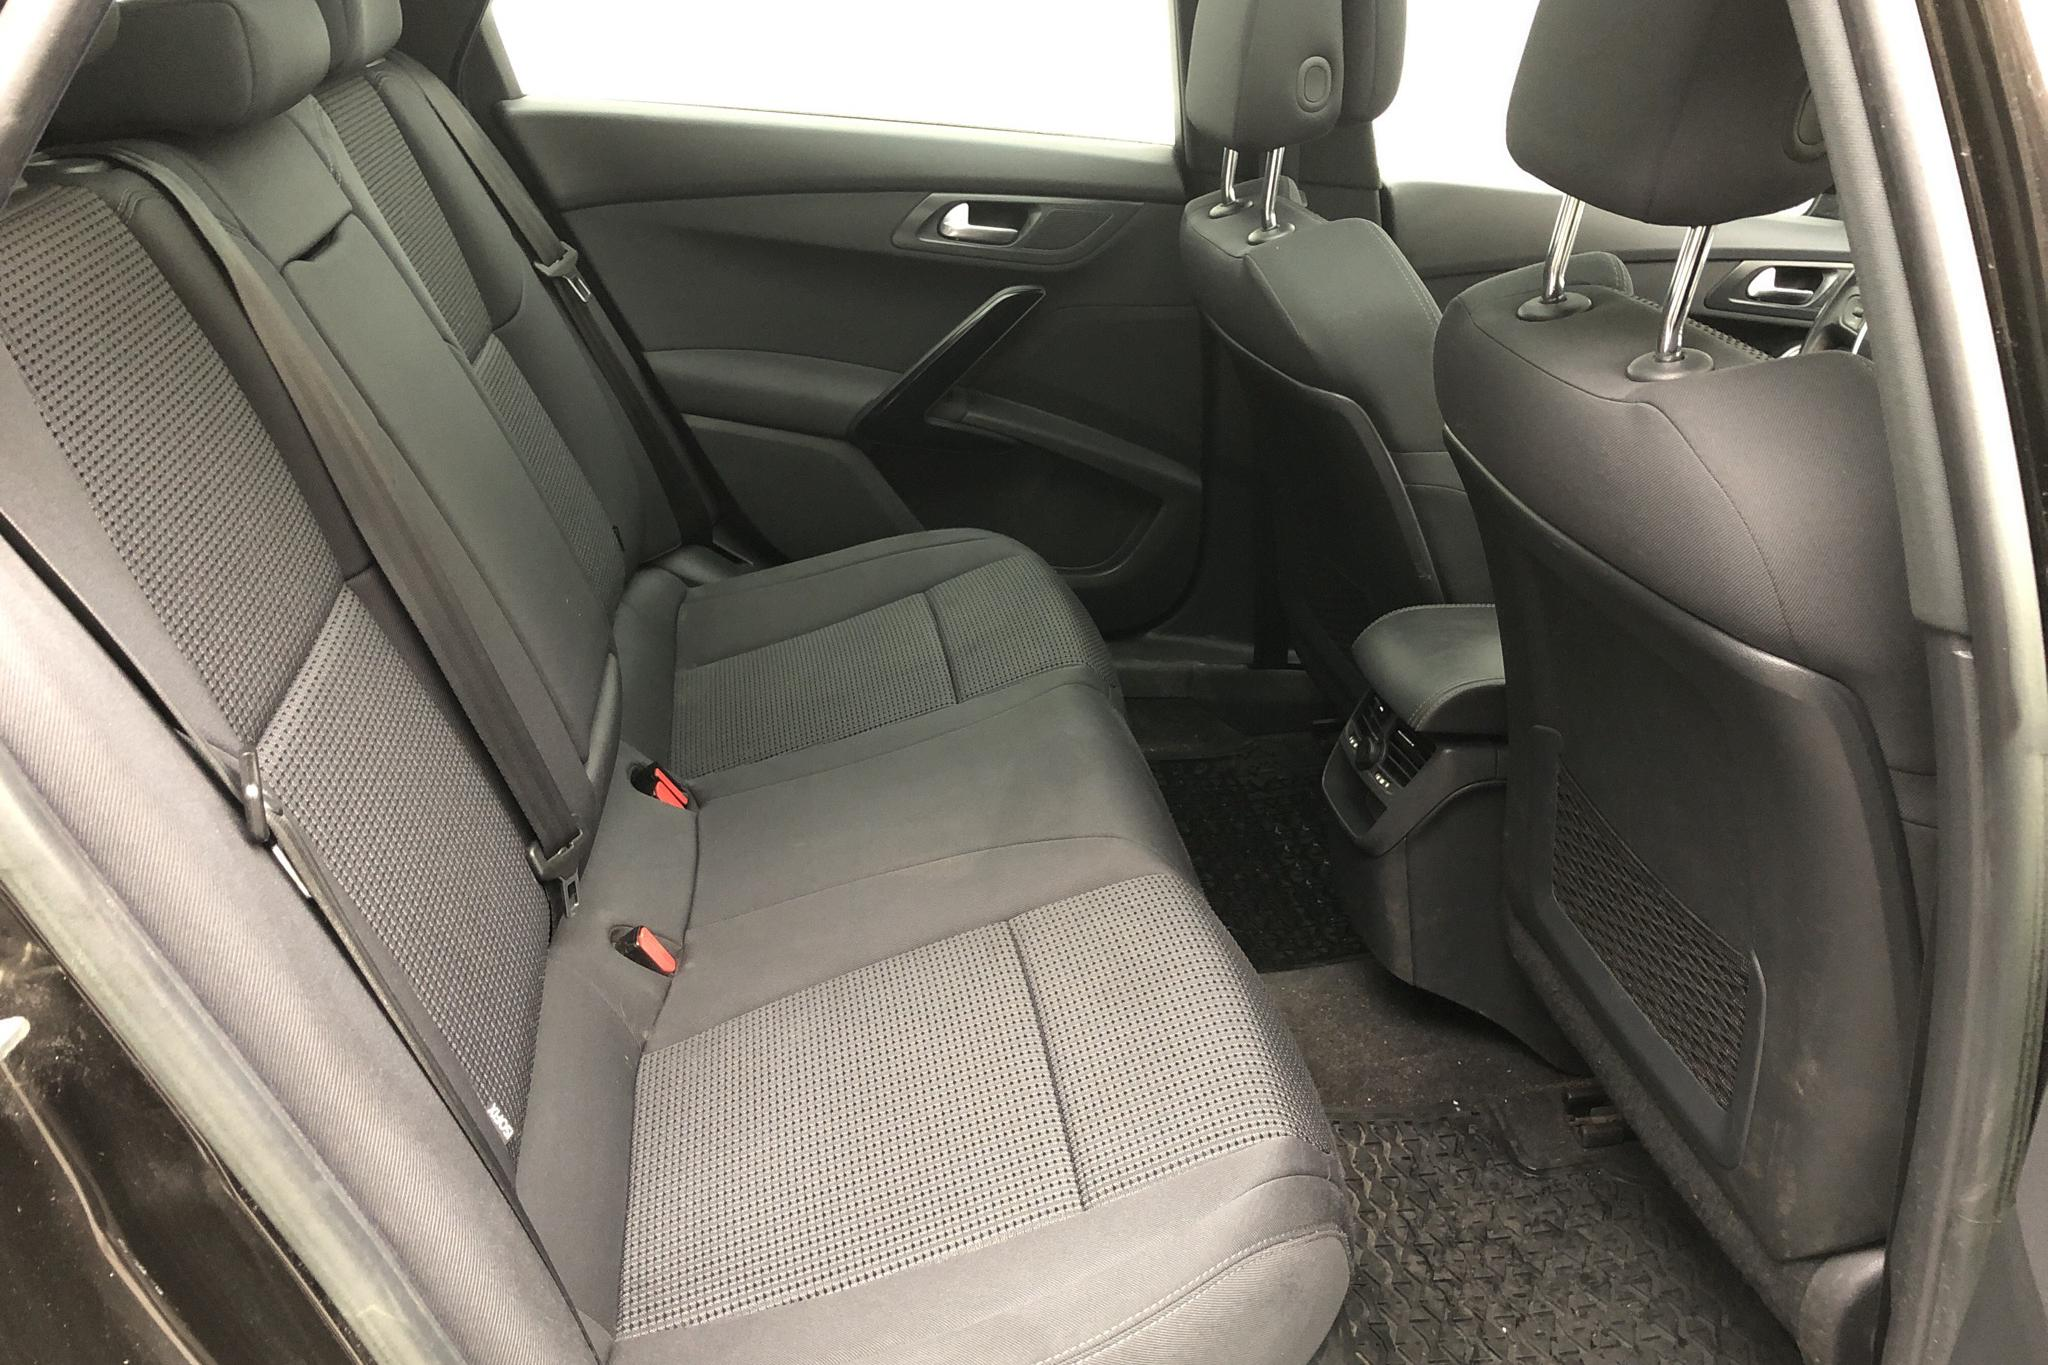 Peugeot 508 SW 1.6 Turbo (156hk) - 12 188 mil - Manuell - brun - 2011